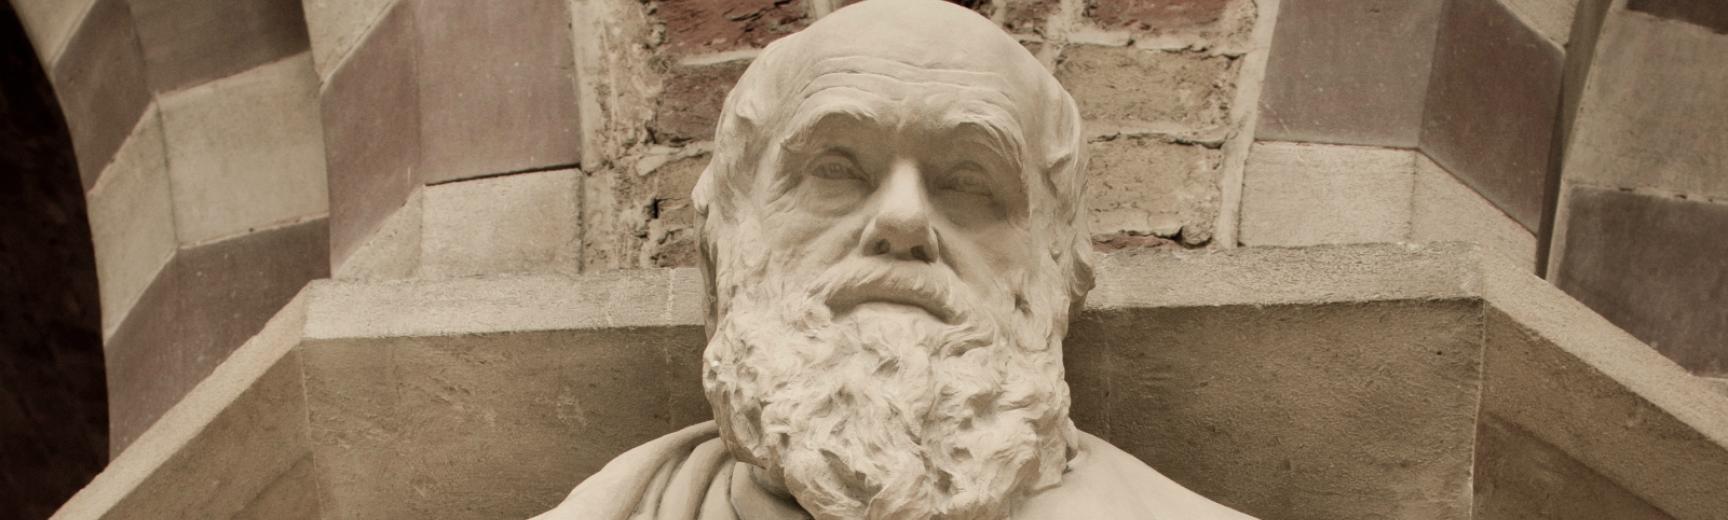 Darwin's statue